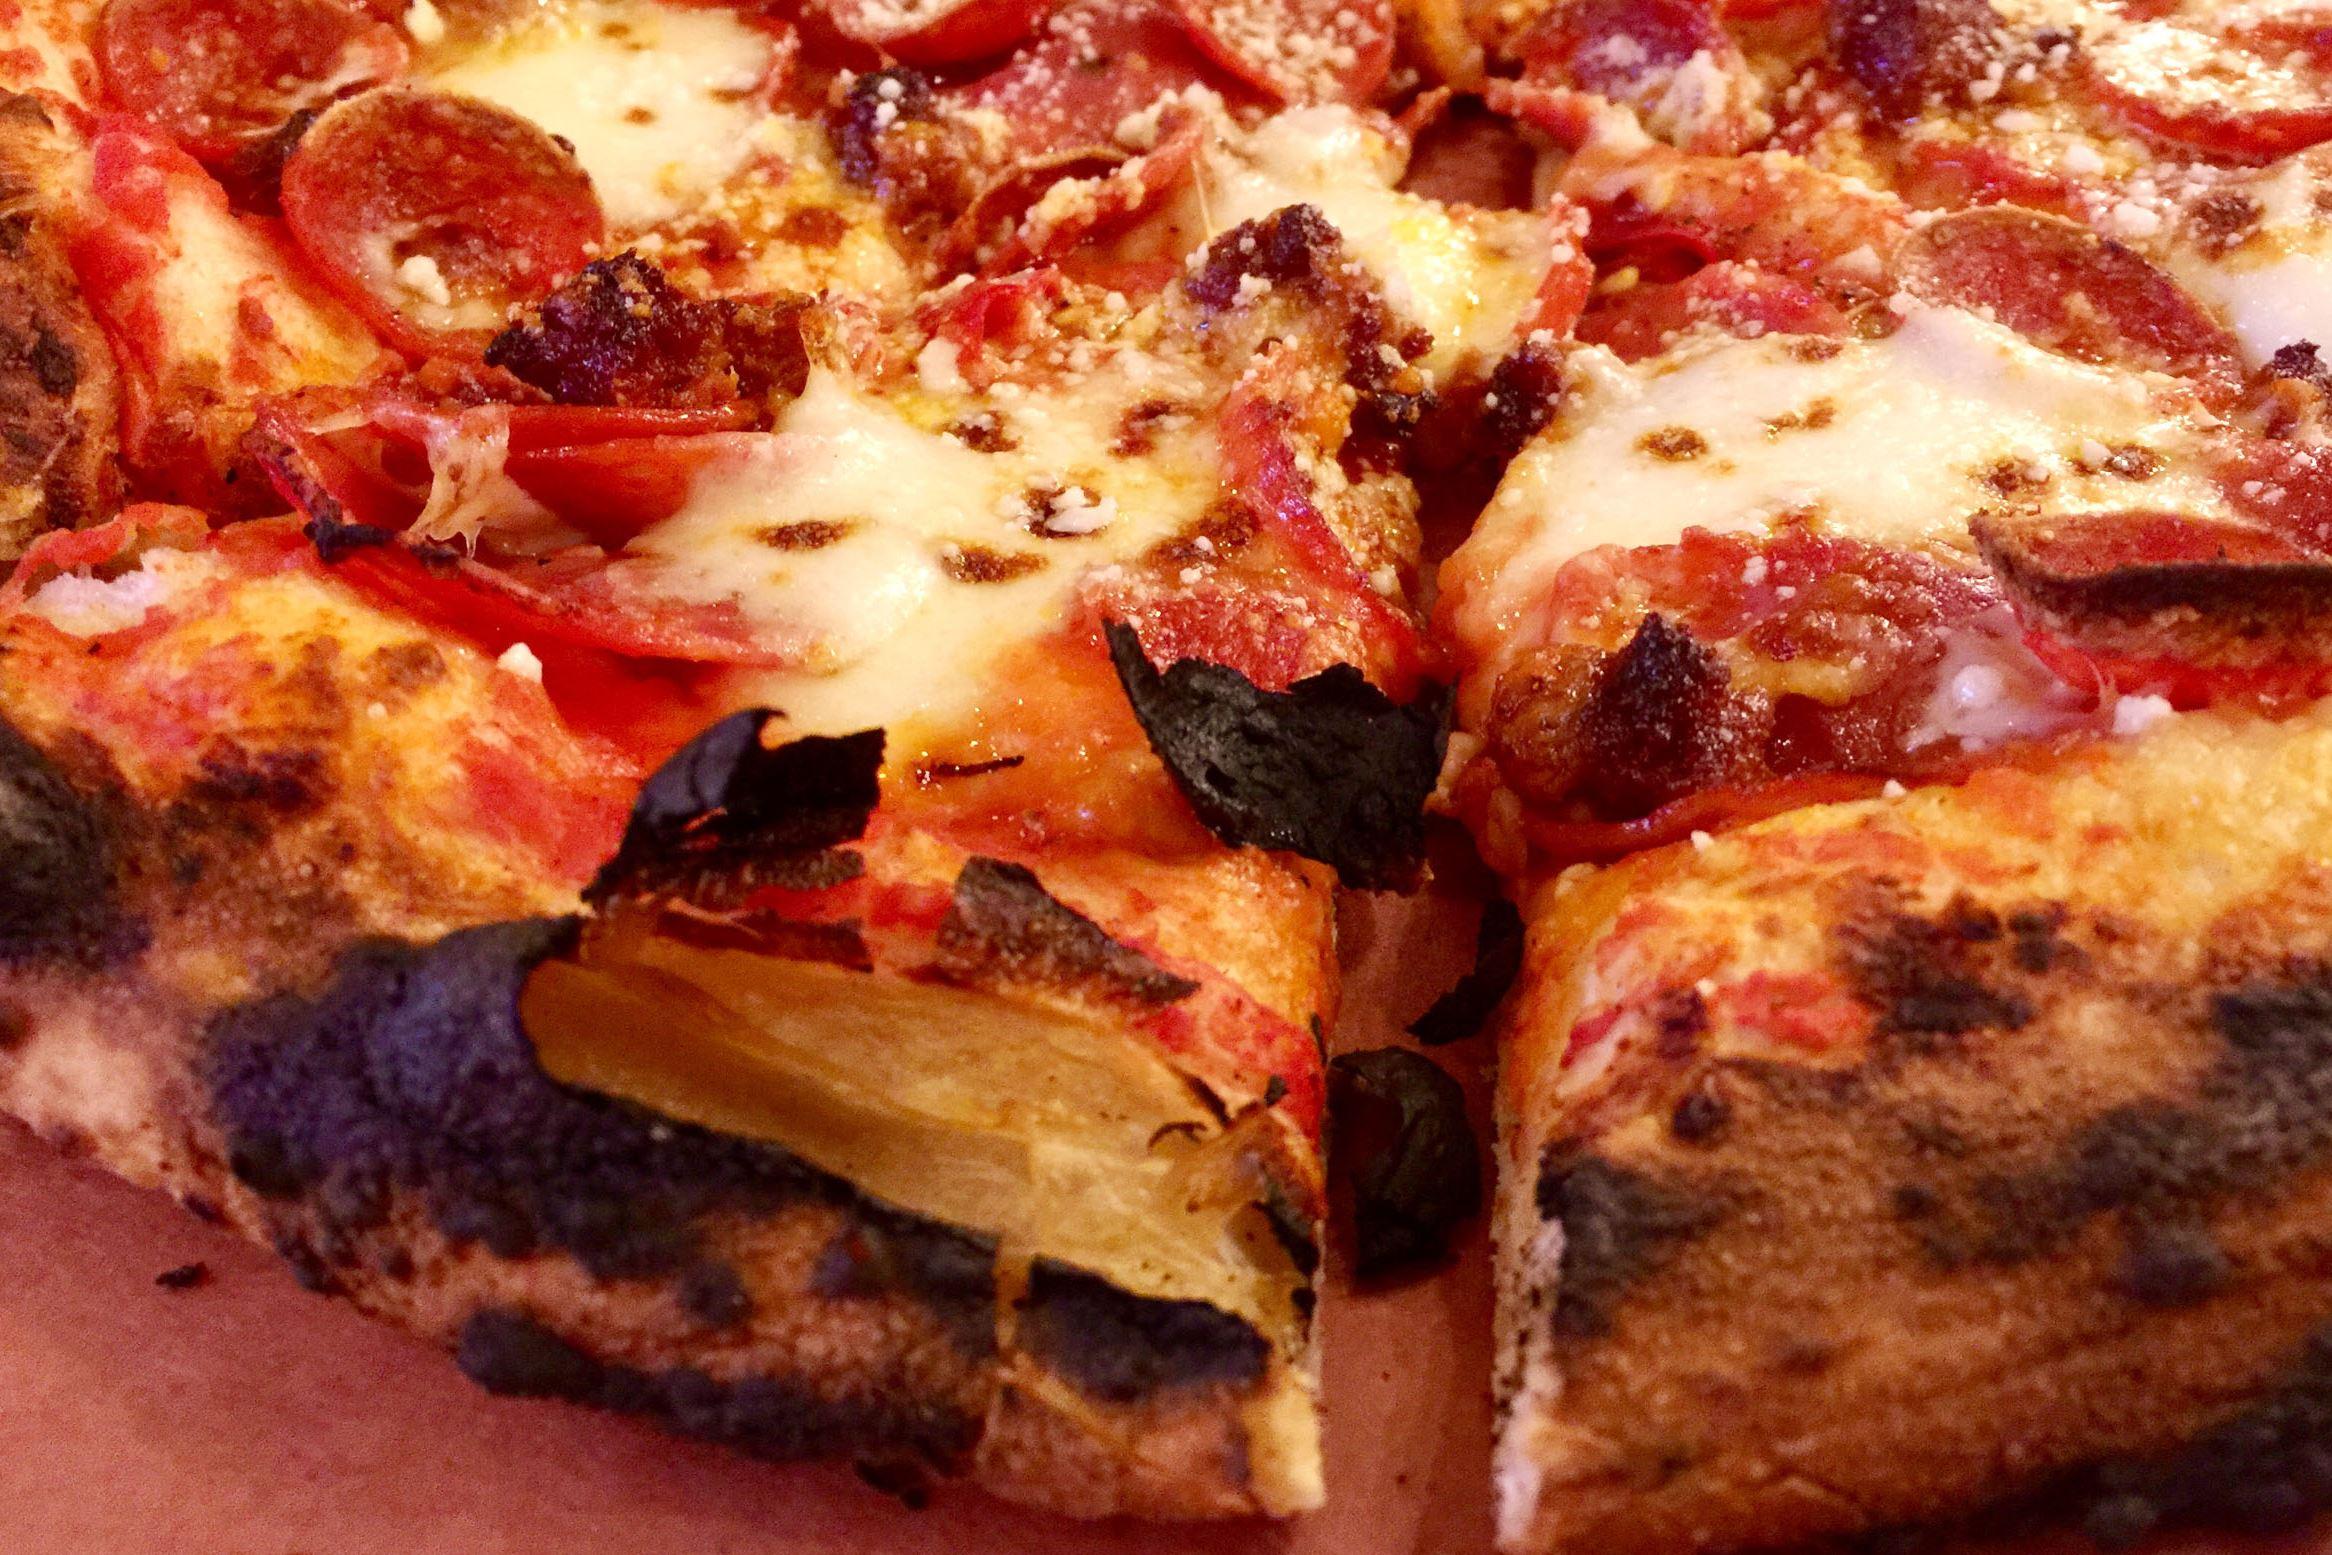 "munch dal forno 02-2 The ""Meat & Spice"" pizza at Dal Forno in North Huntington includes tomato sauce, nduja, hot soppressata, pepperoni, Calabrese peppers, and buffalo mozzarella."